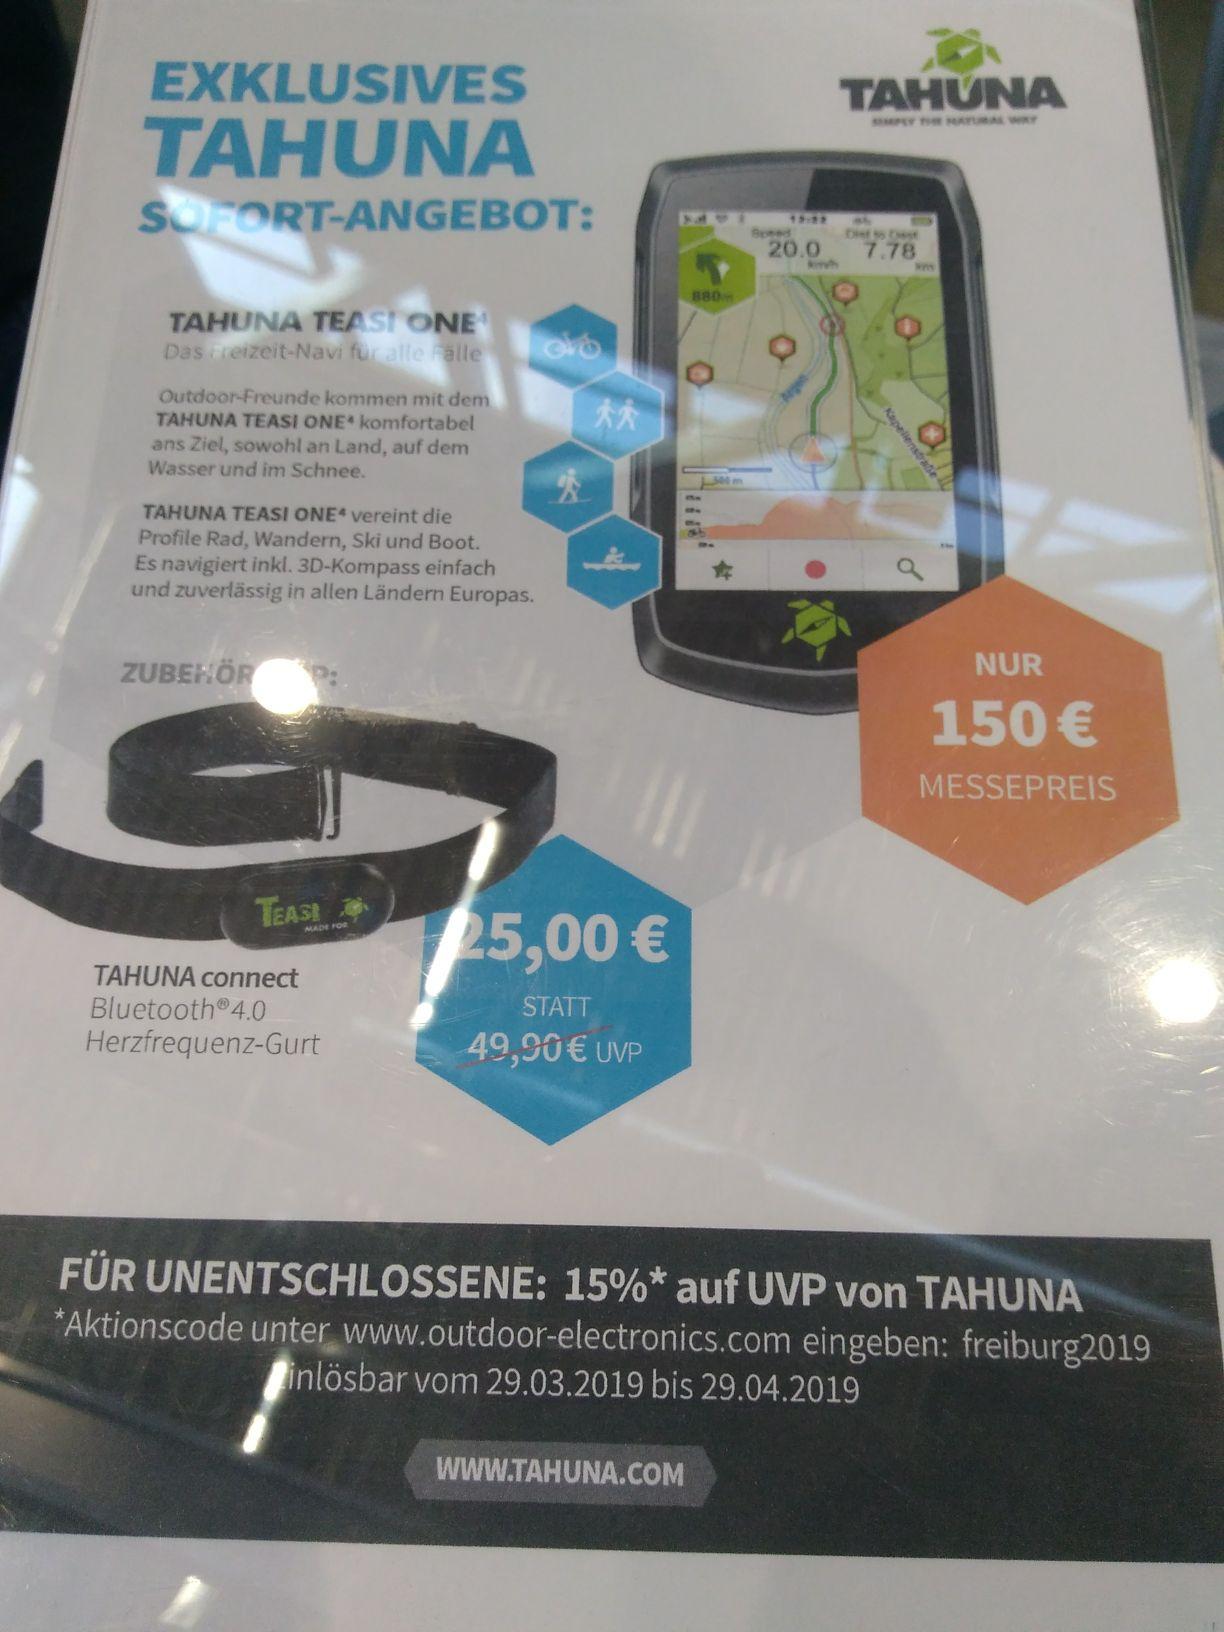 GPS-Gerät Tahuna Teasi one 4 mit HR-Gurt (neues Modell)